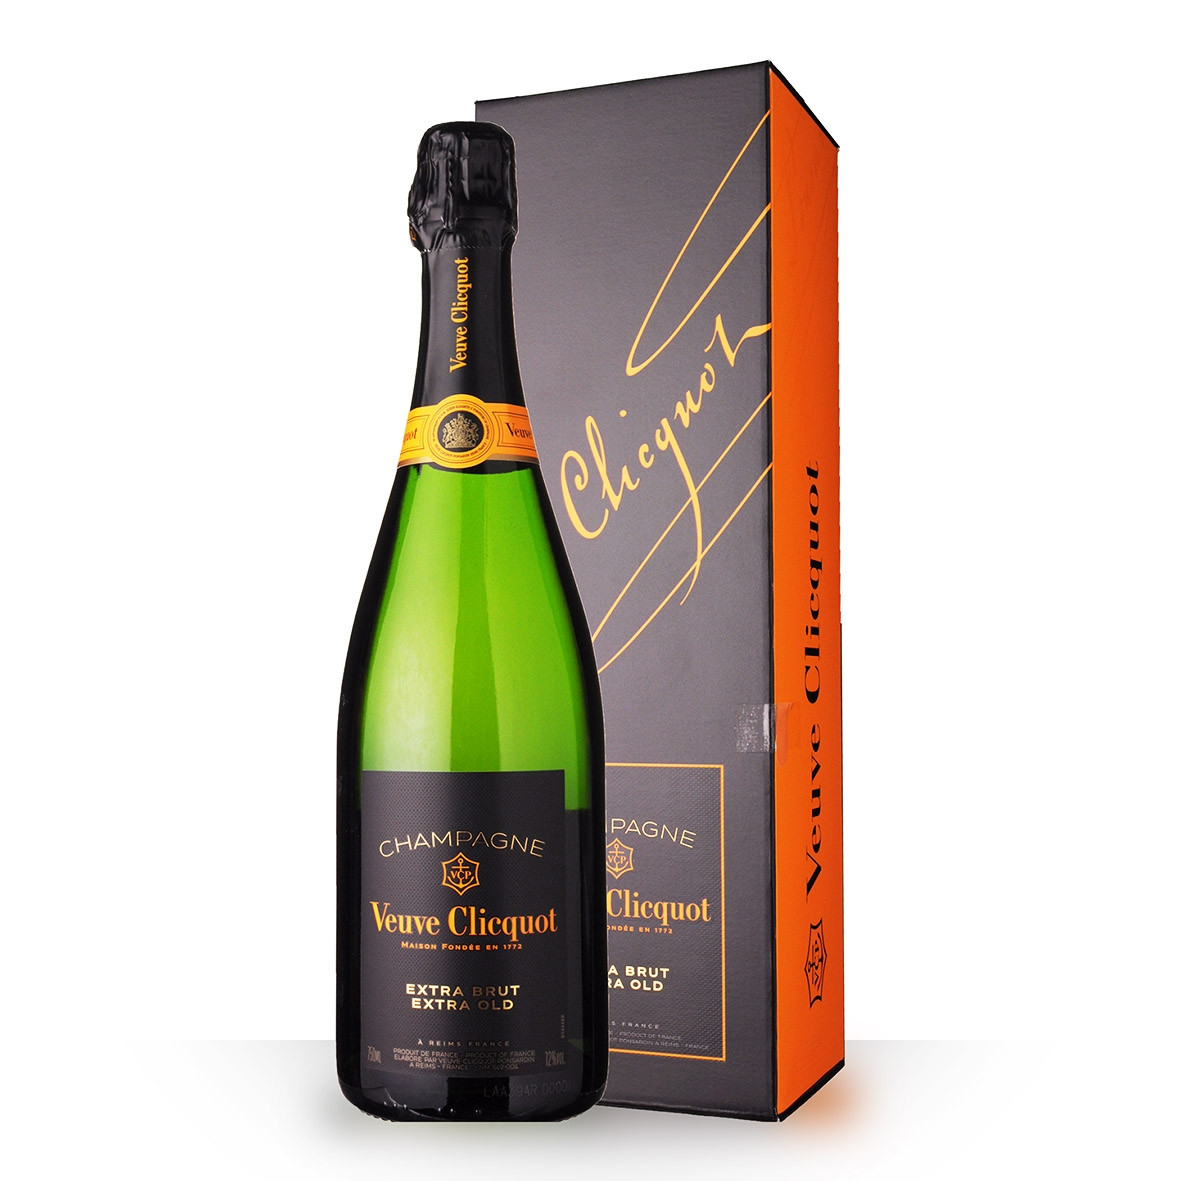 Champagne Veuve Clicquot Extra Brut 75cl Etui www.odyssee-vins.com